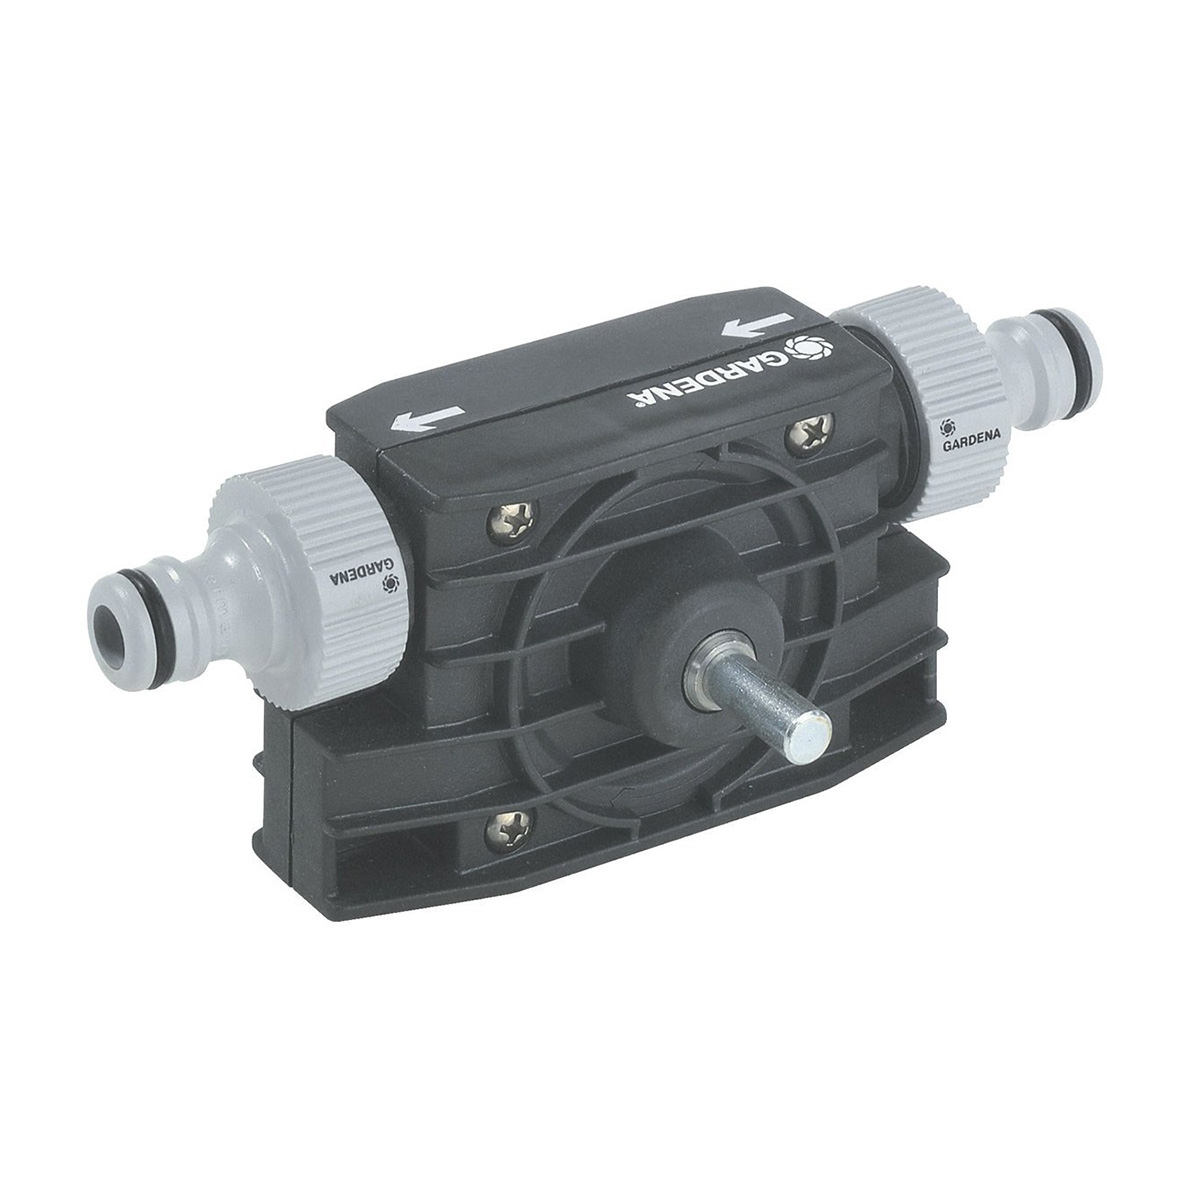 GARDENA 1490-20 Drill Pump